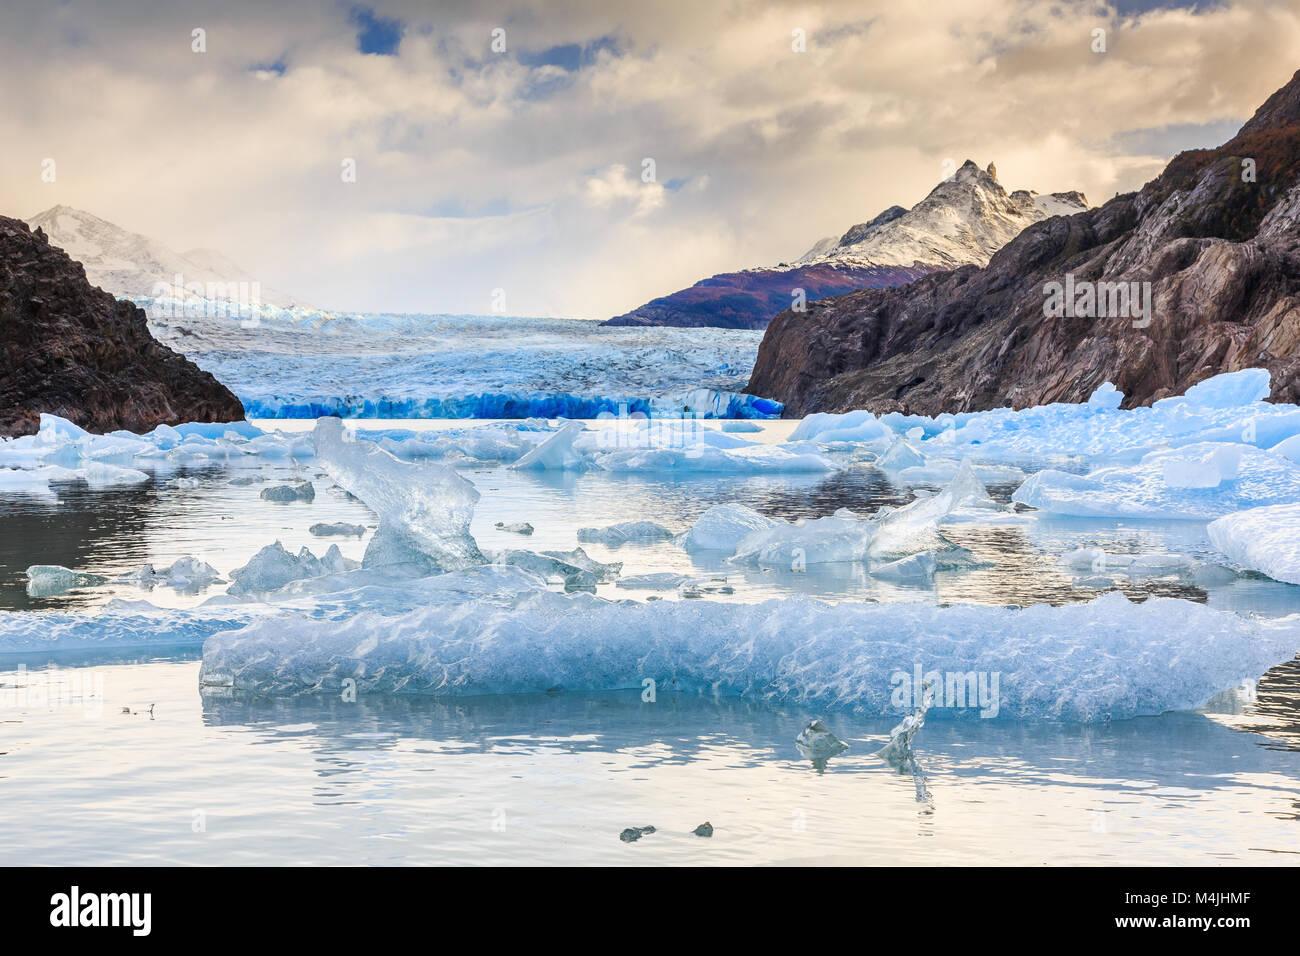 Parc National Torres del Paine, Chili. Glacier Grey. Photo Stock